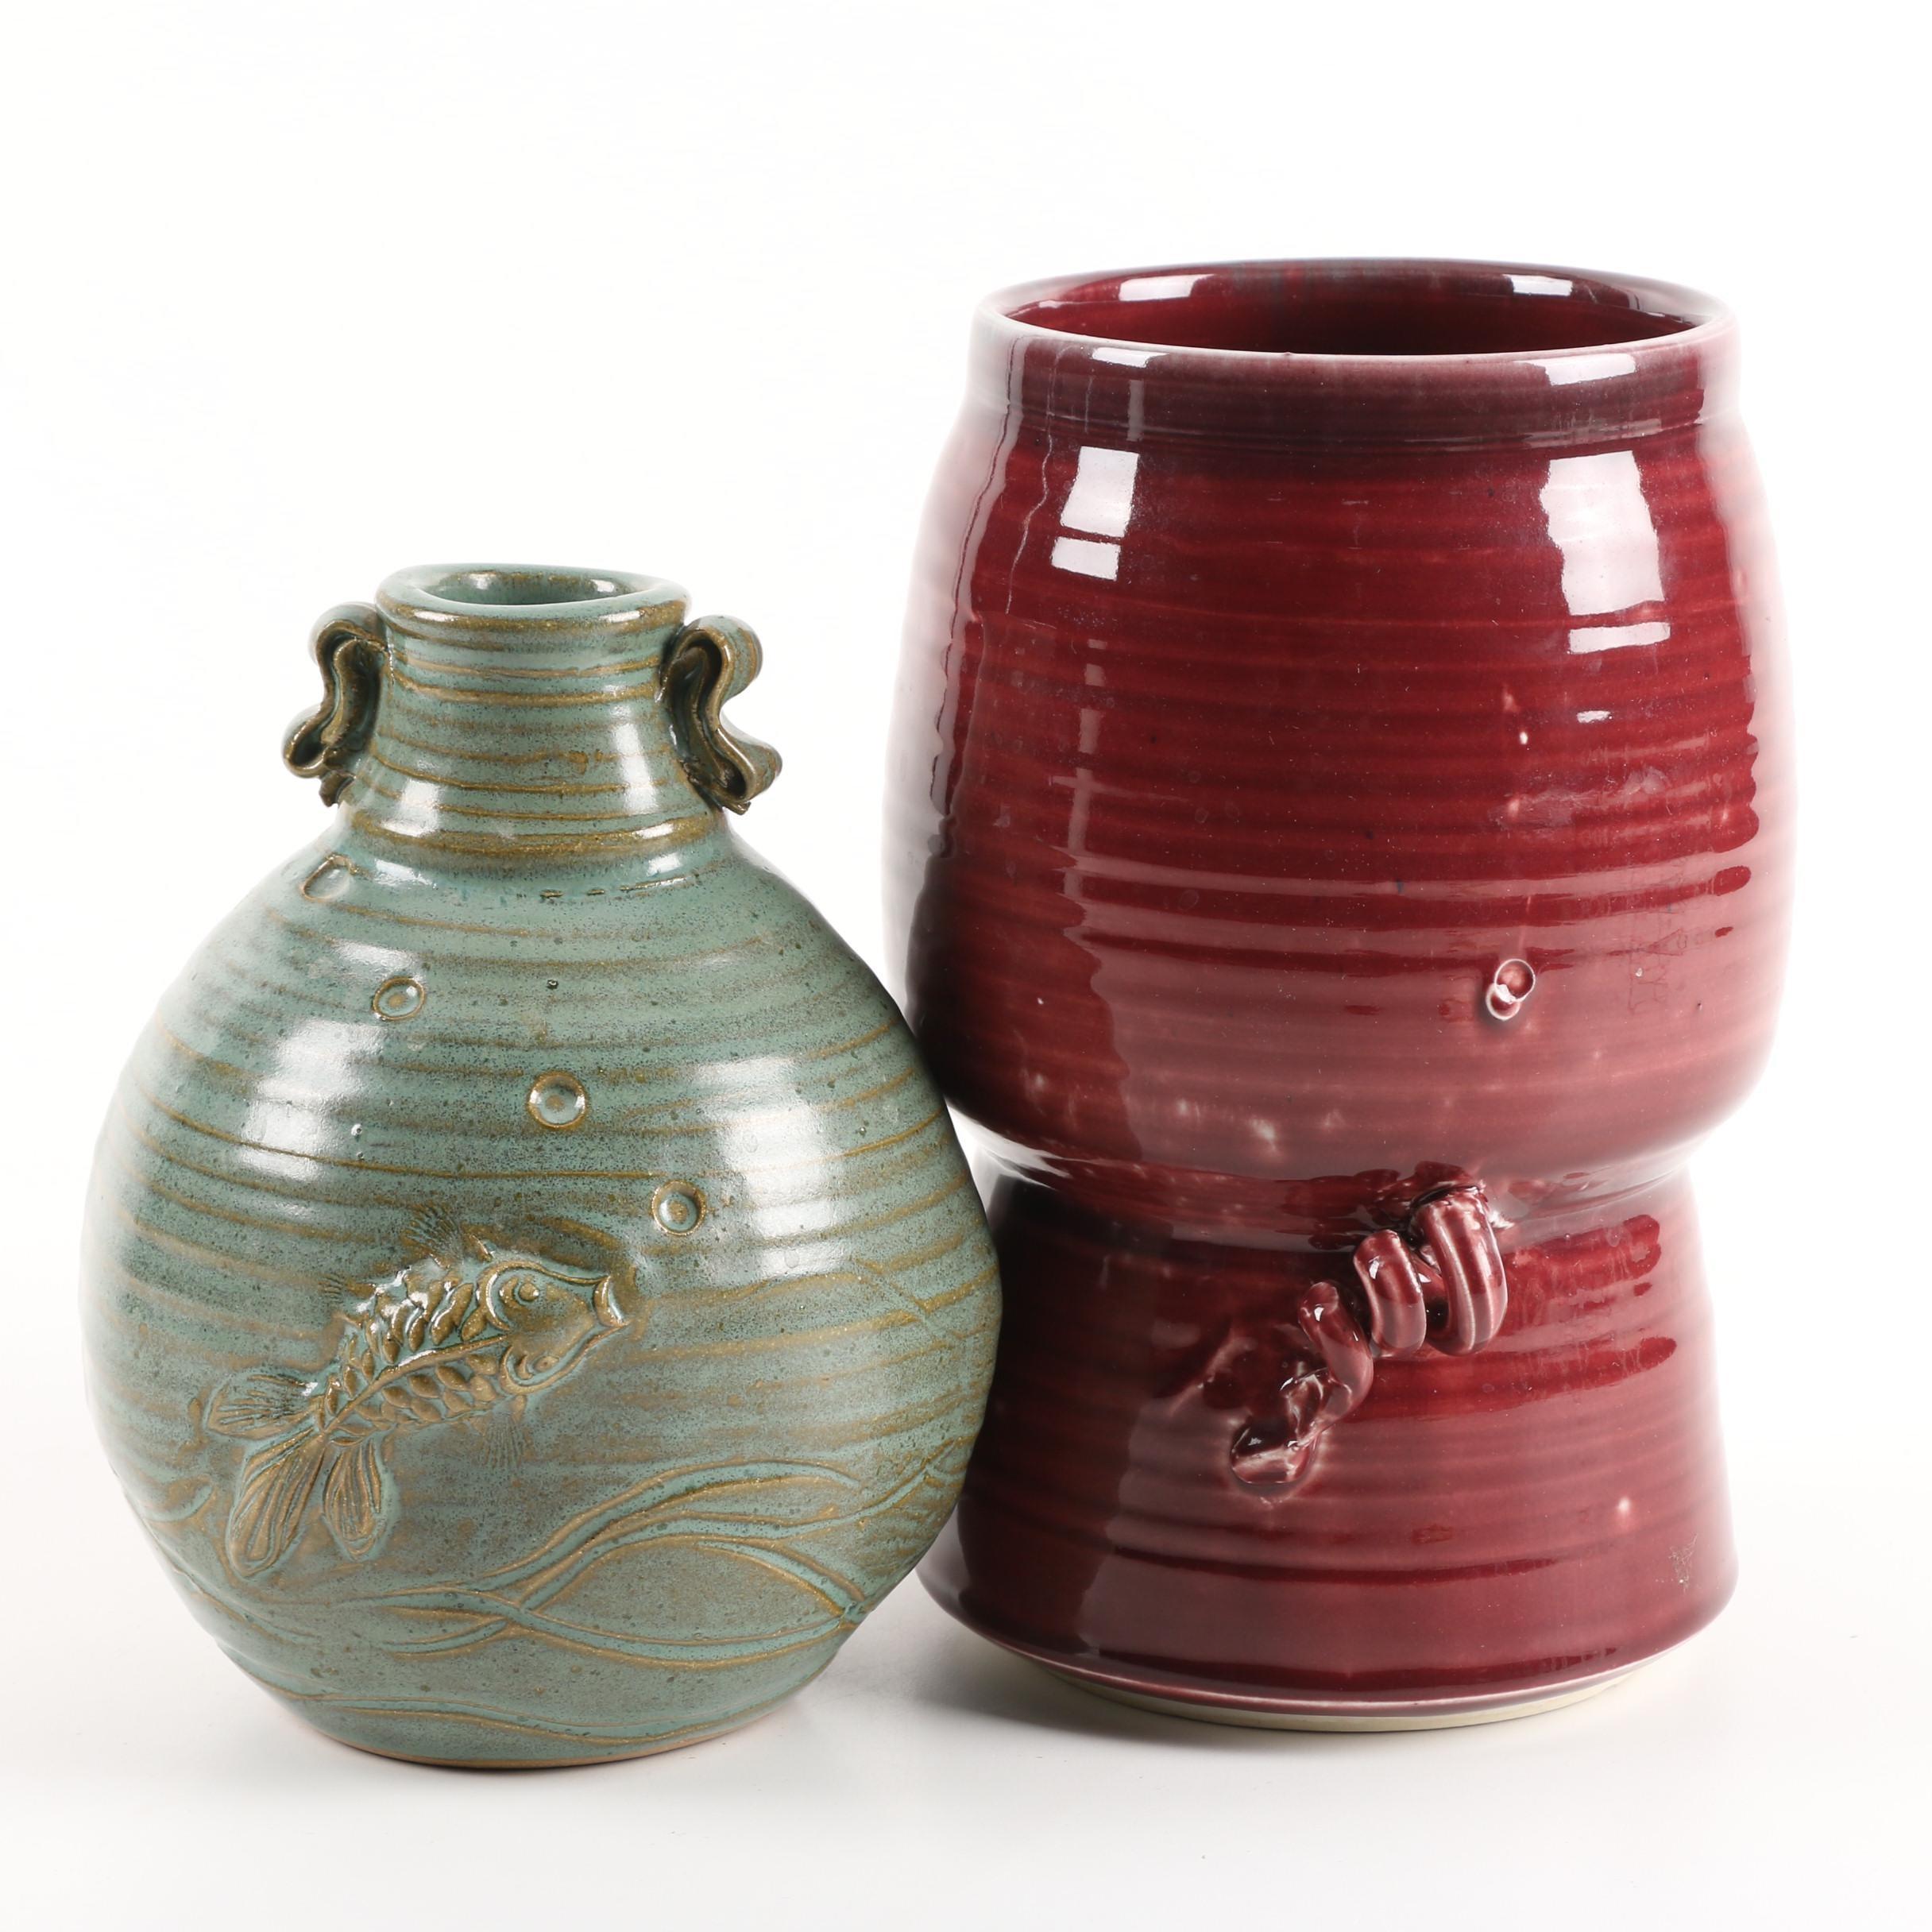 Signed Wheel Thrown Stoneware Vases